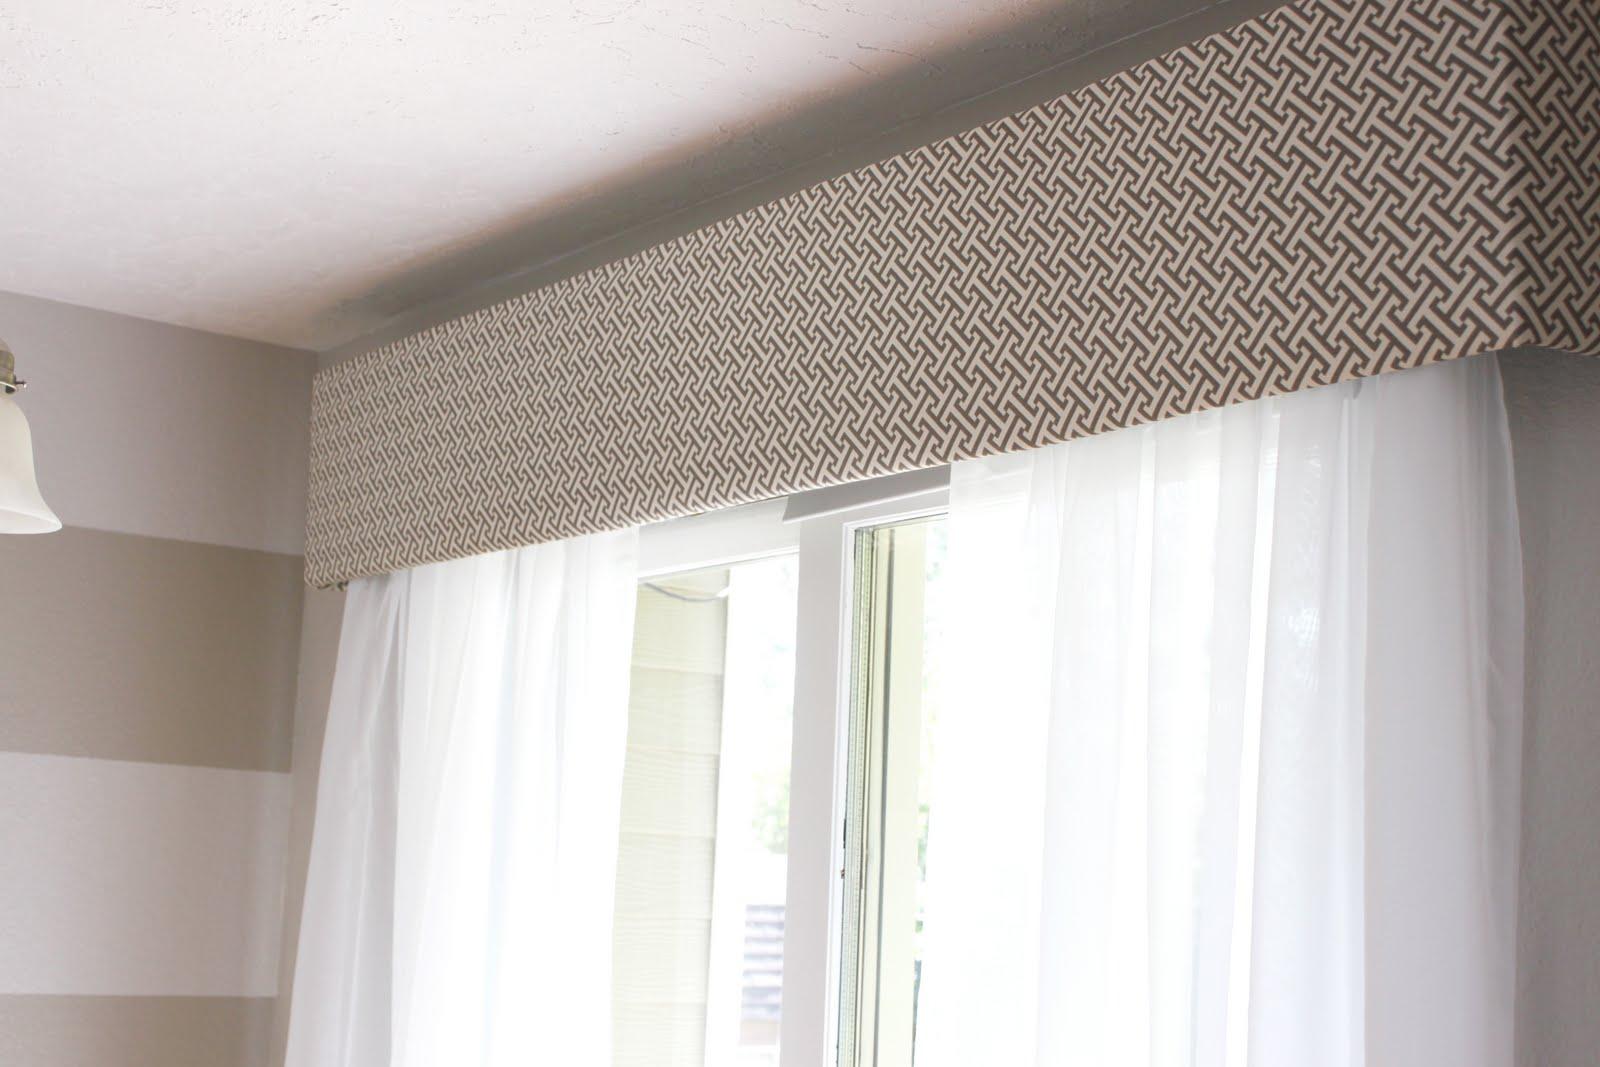 OMH: Cornice Box Help and the Sliding Glass Window